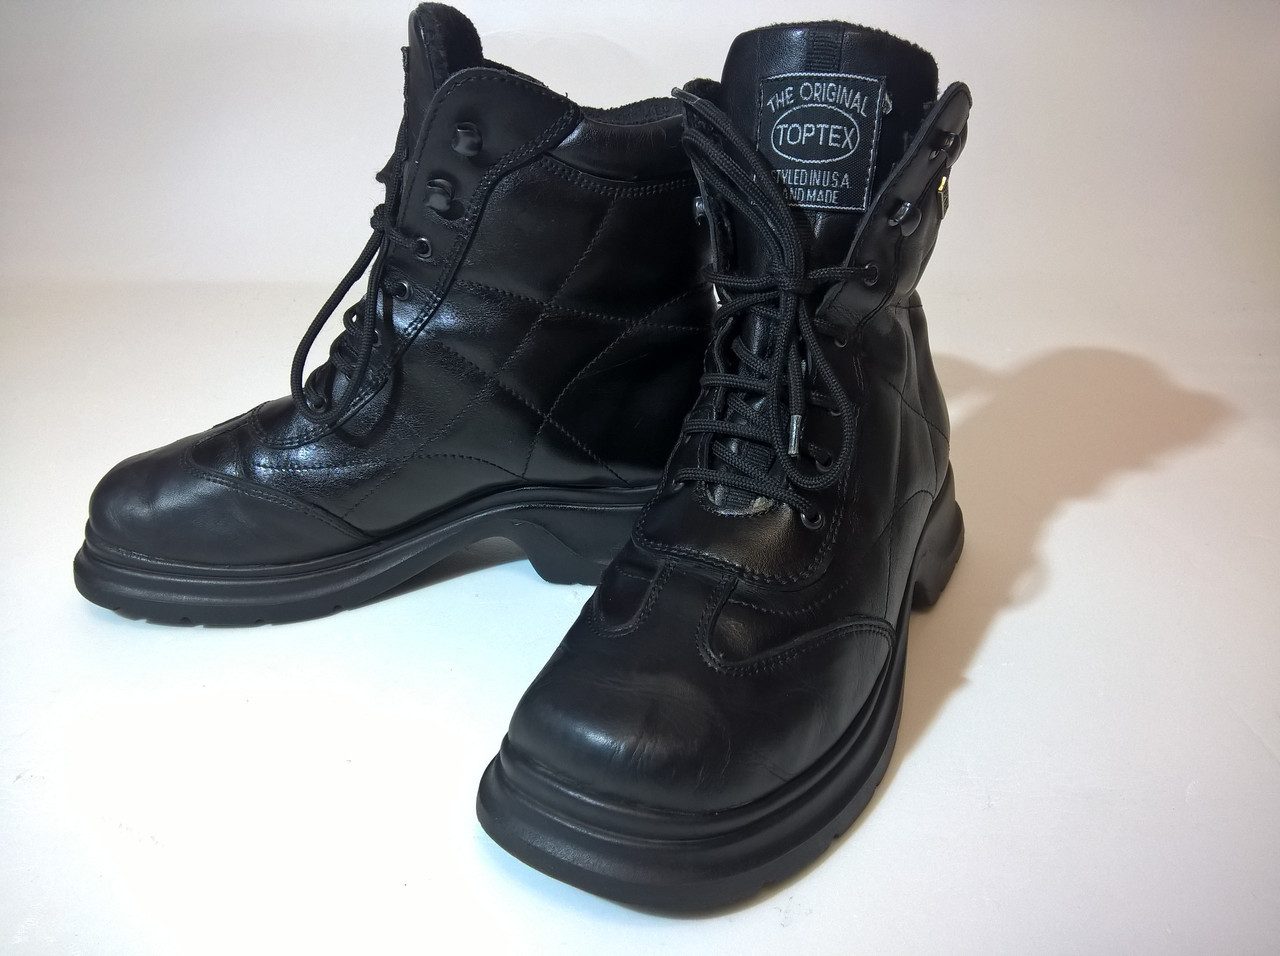 Ботинки  39 размер женские TOPTEX